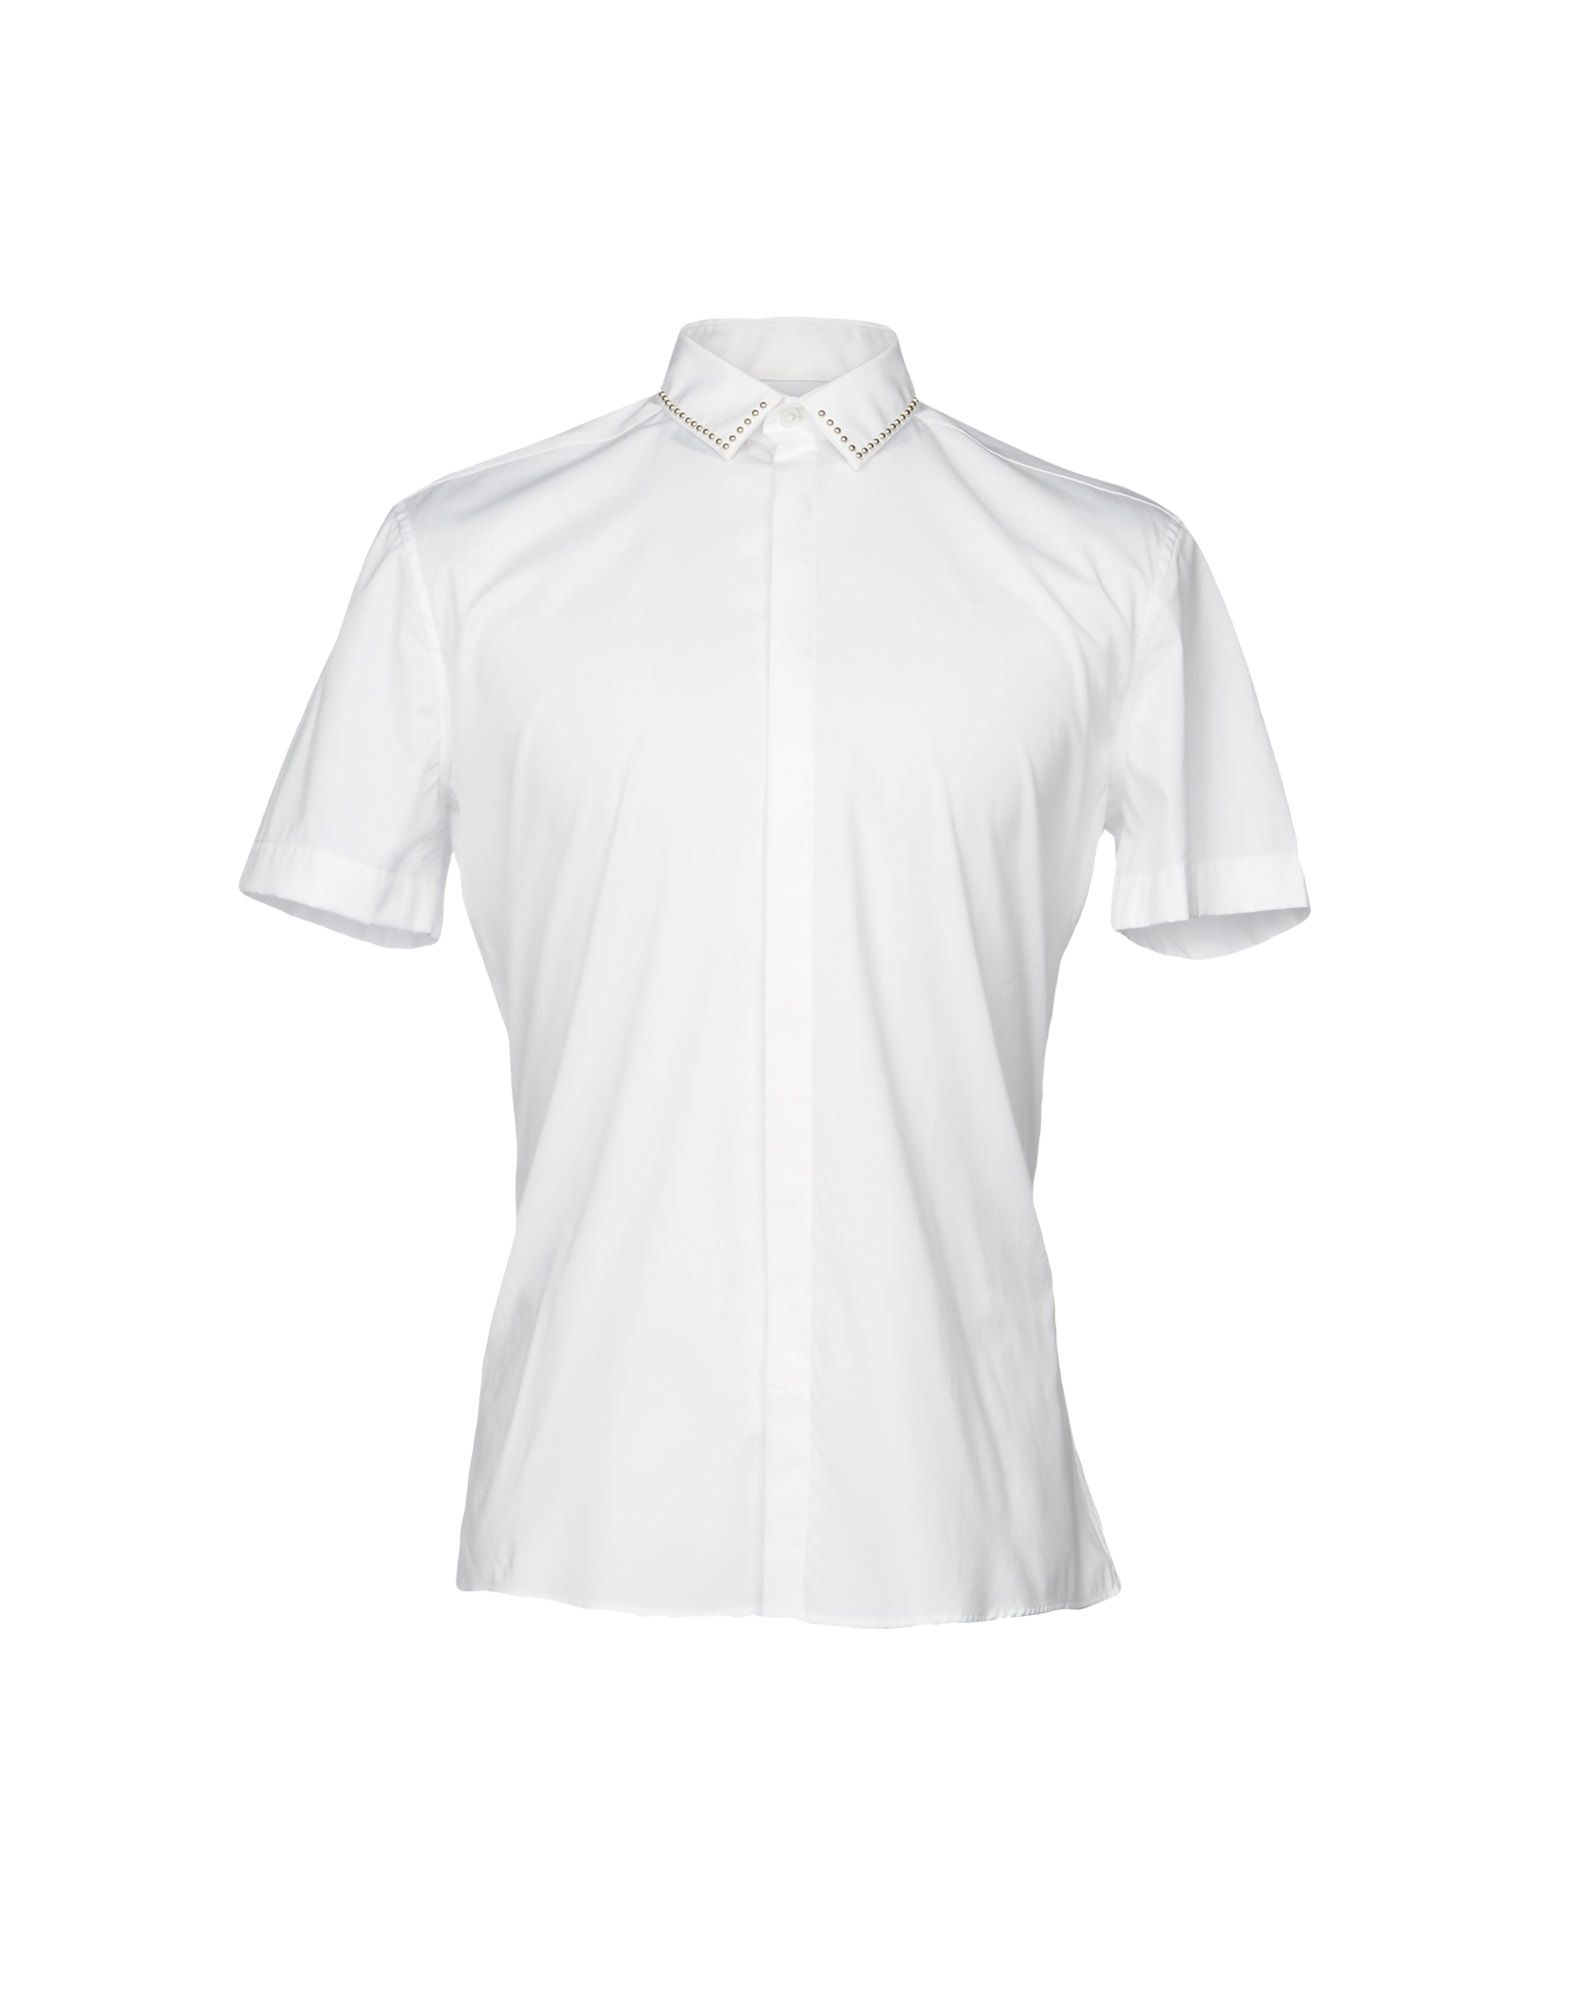 Camicia Tinta Unita Les Hommes Uomo - Acquista online su